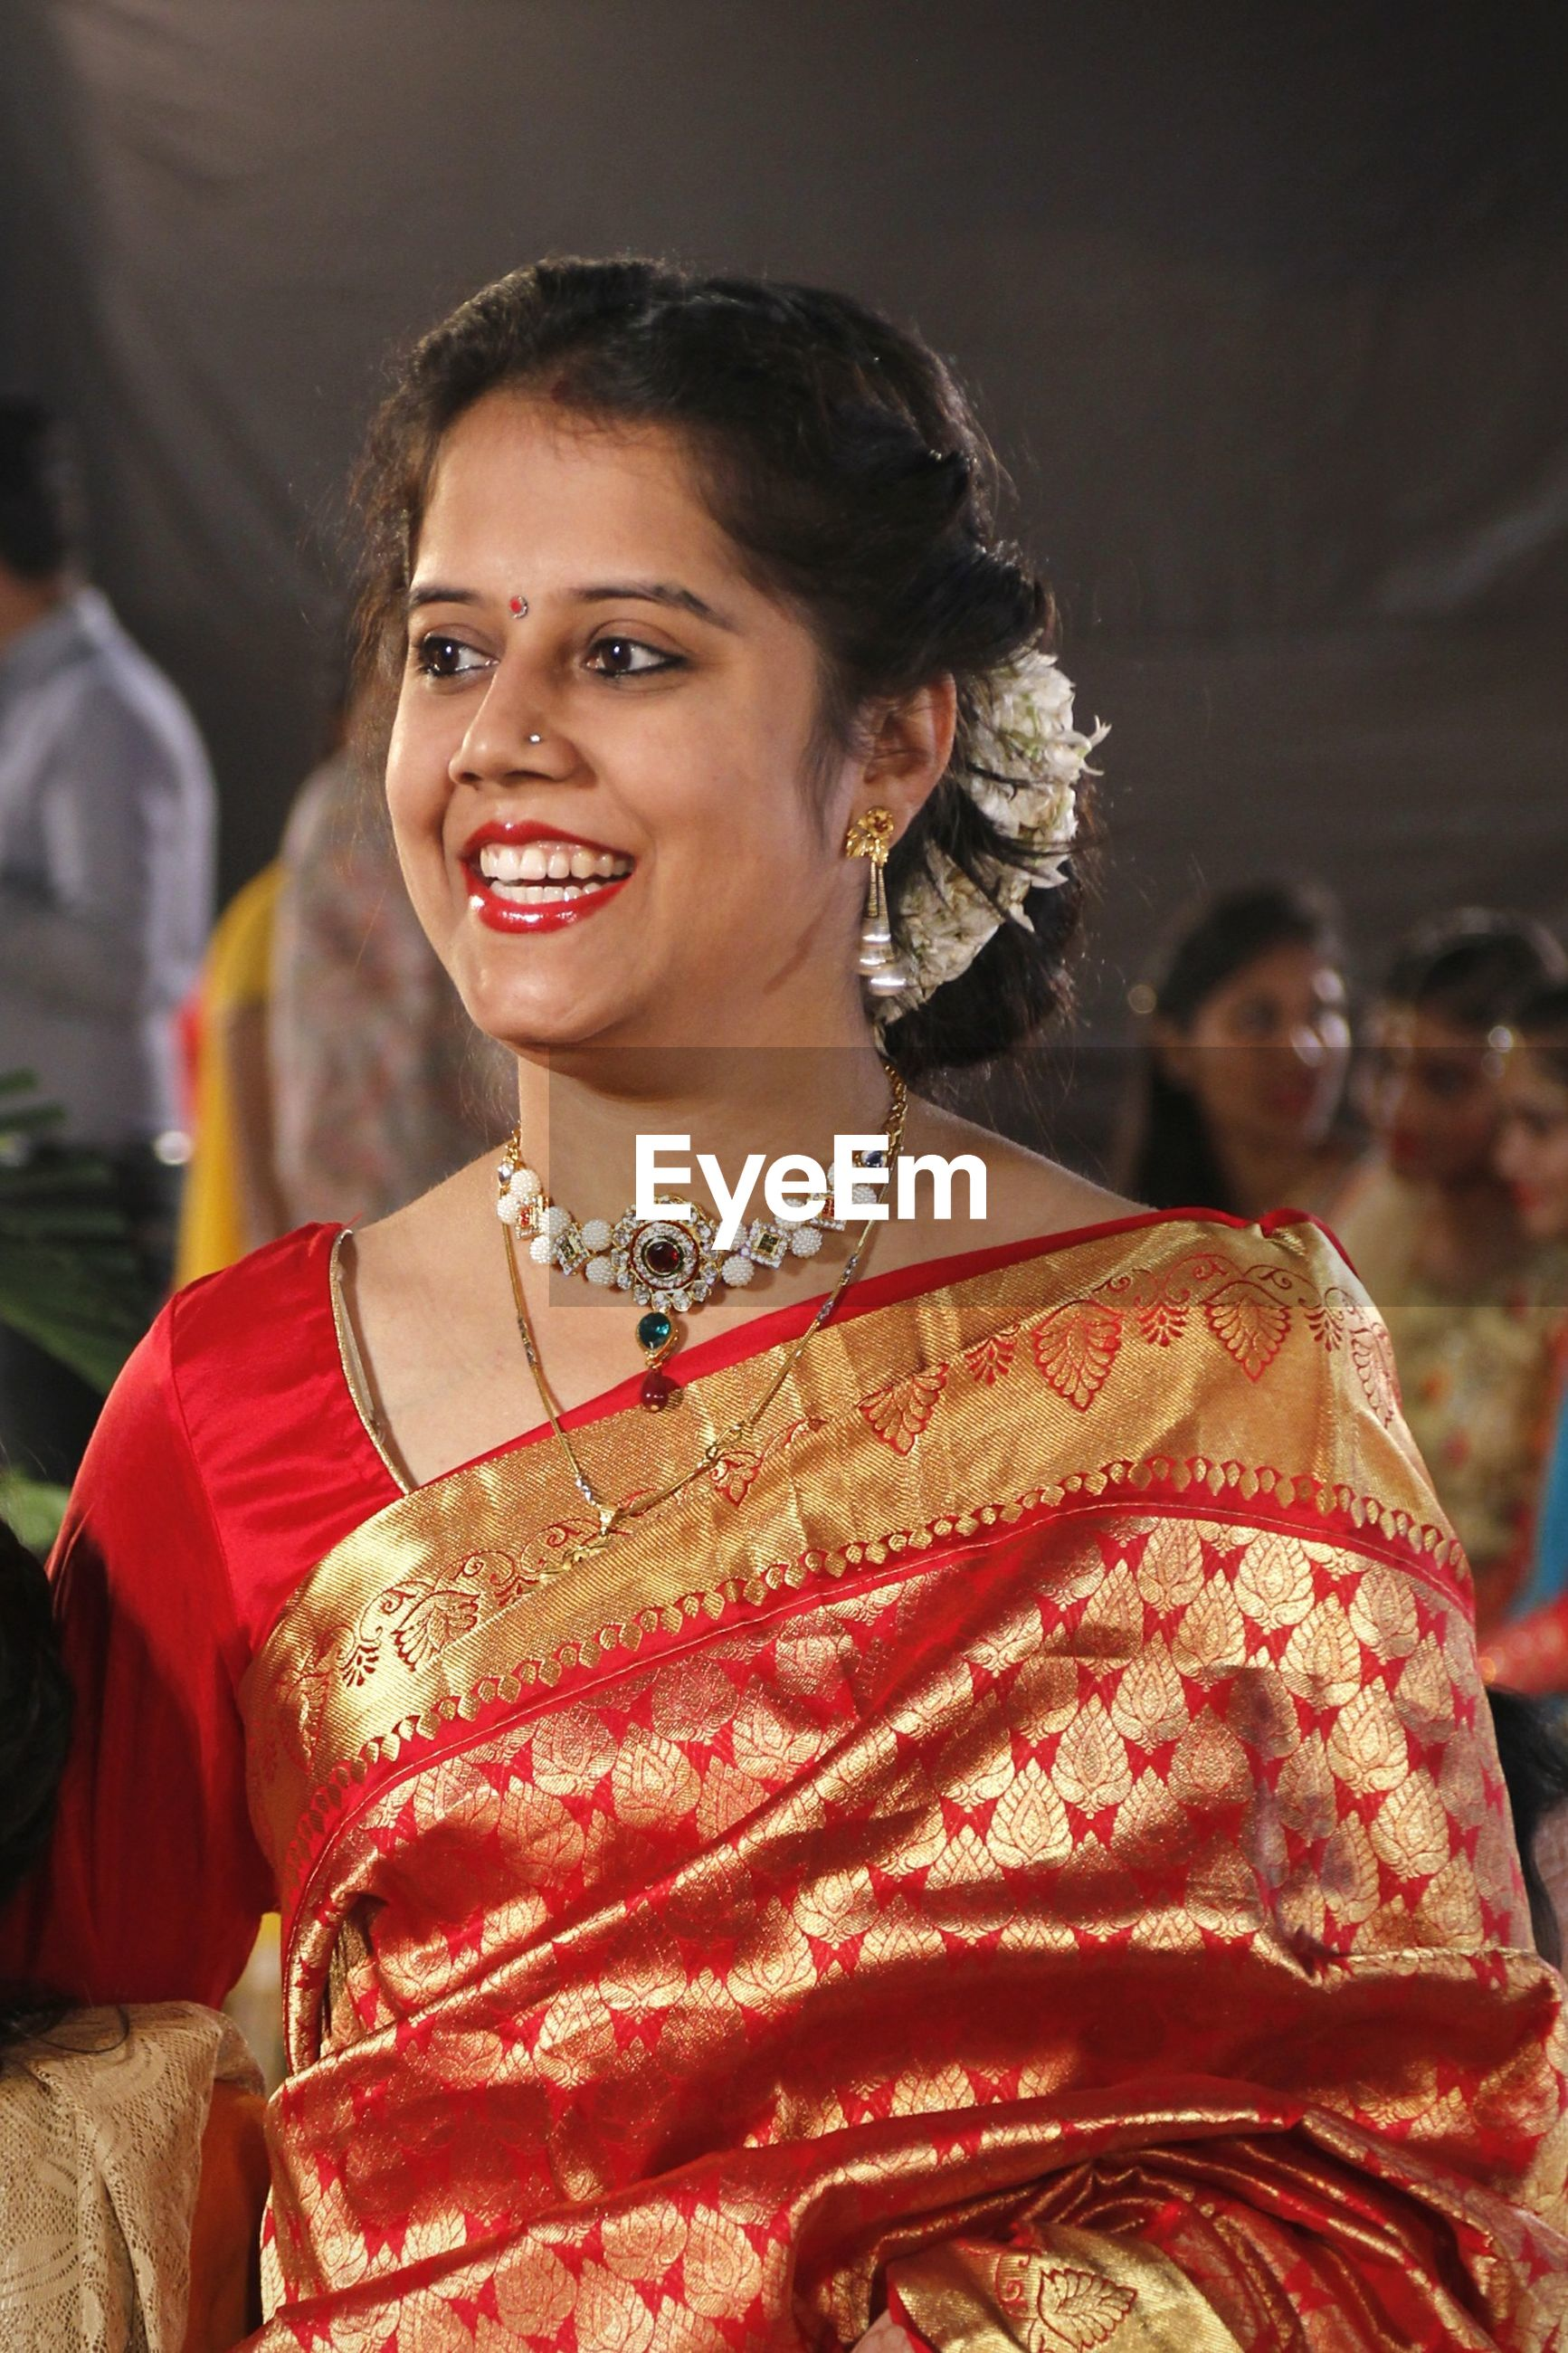 Smiling beautiful woman wearing sari during event